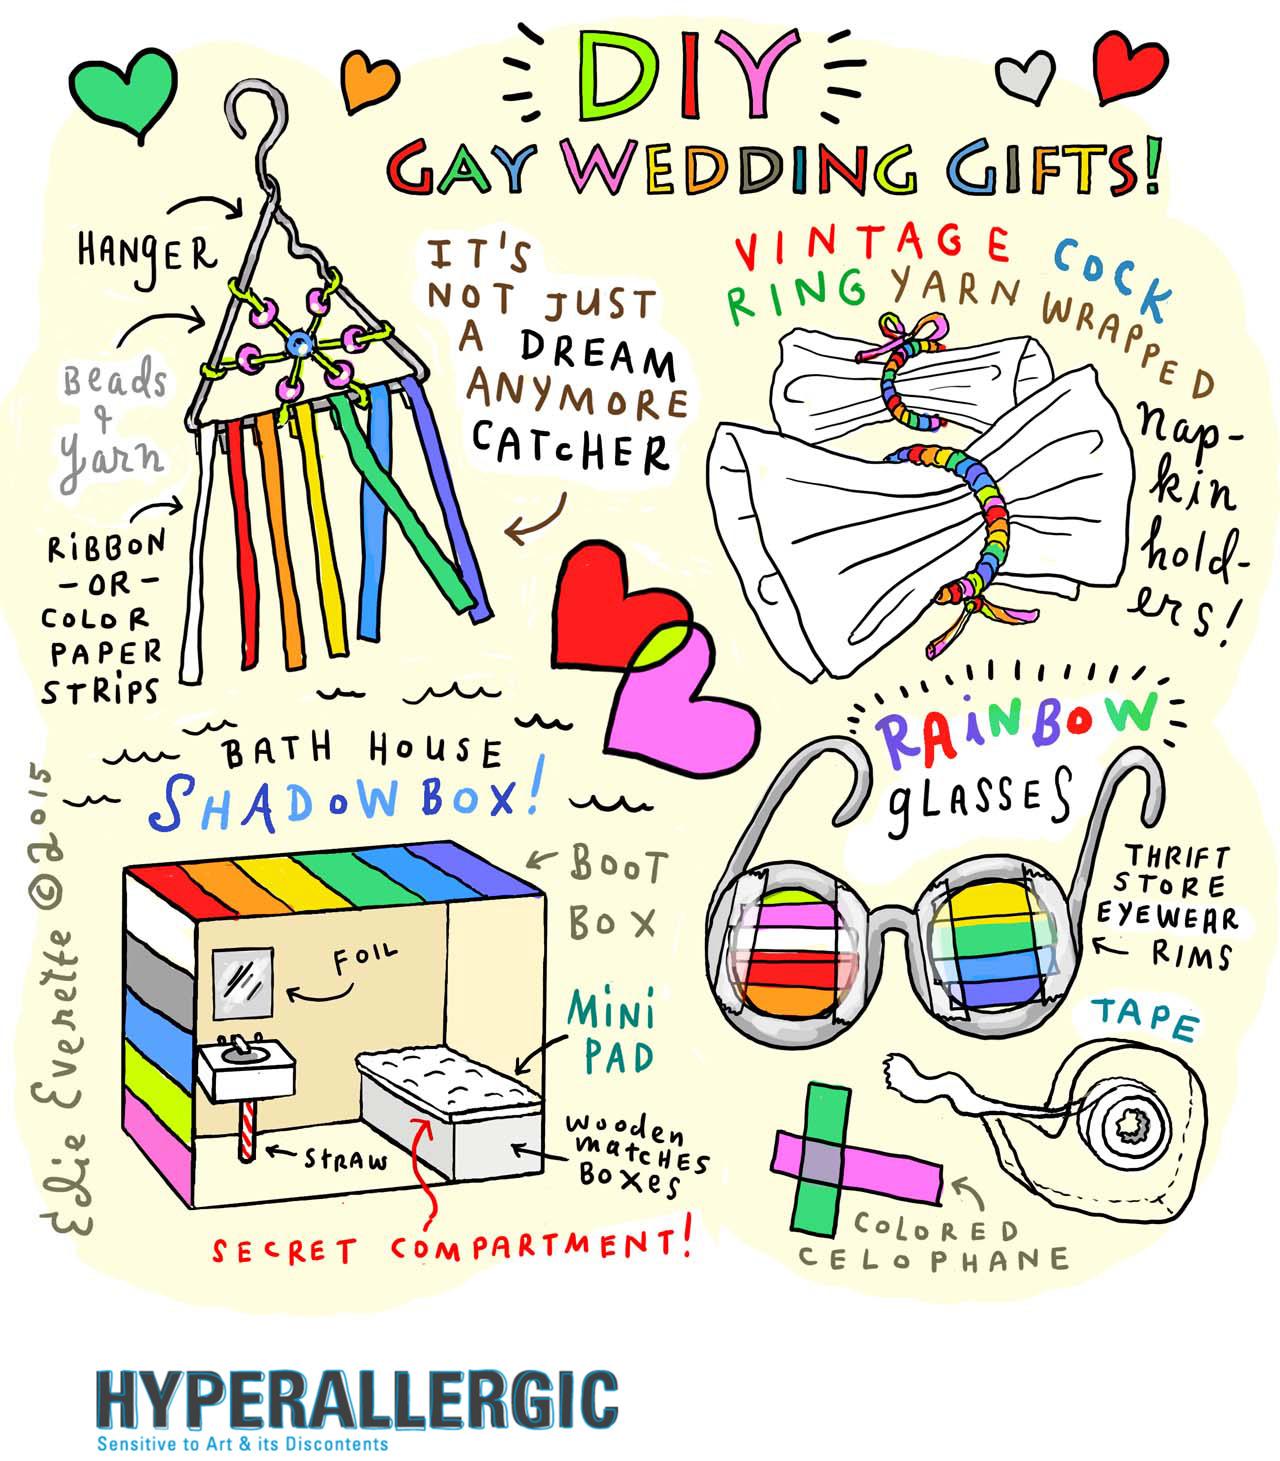 Diy Gay Wedding Gifts